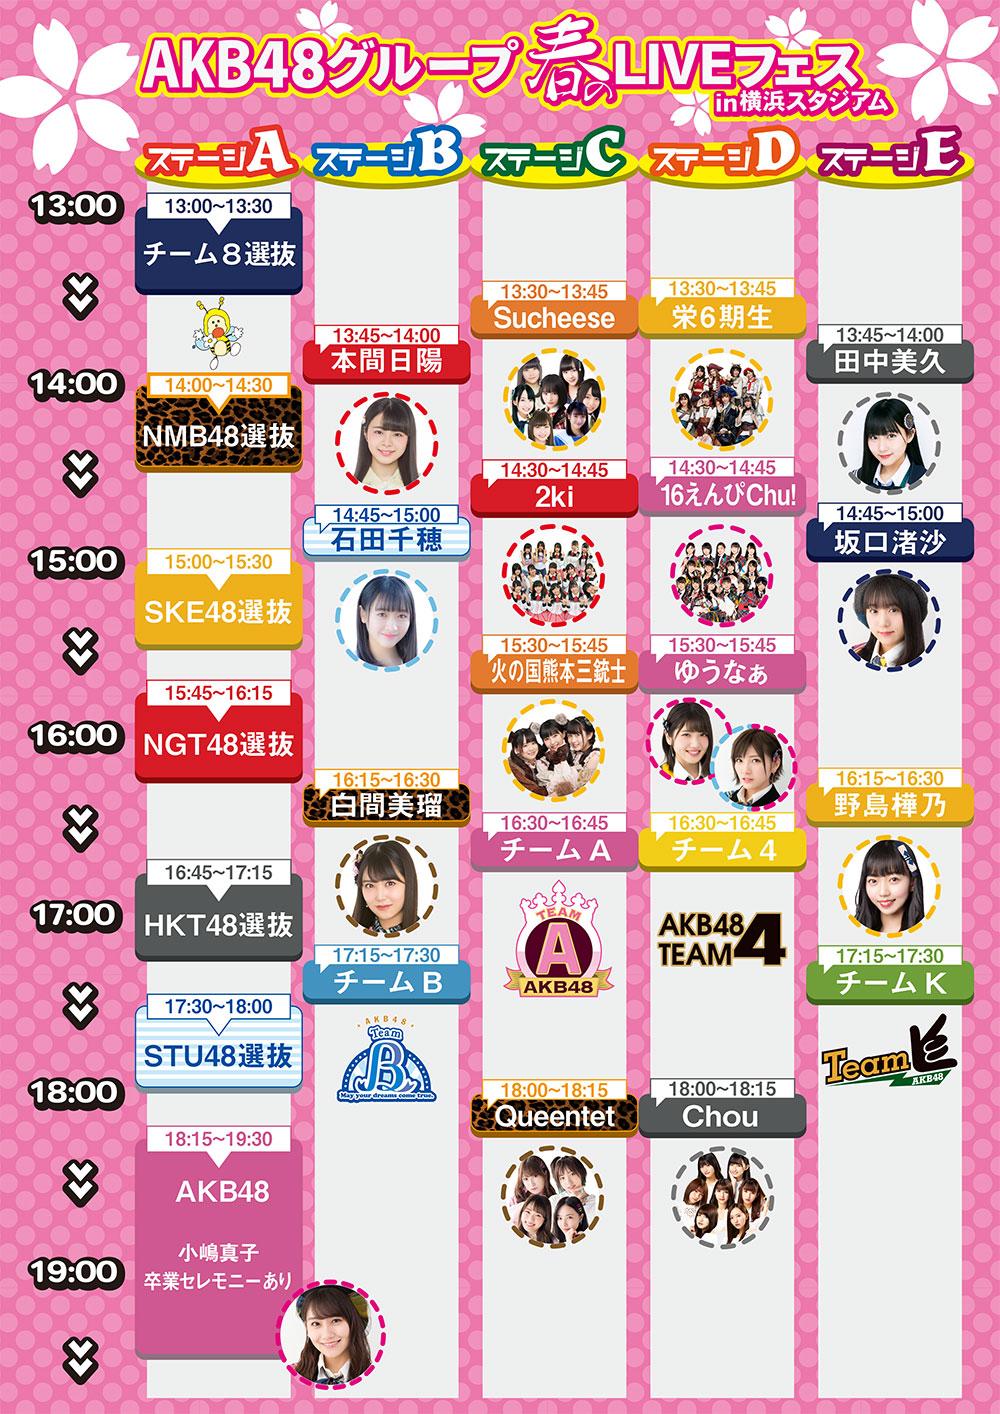 【HKT48】森保まどか☆応援スレ134【もりぽ】 YouTube動画>17本 ->画像>206枚